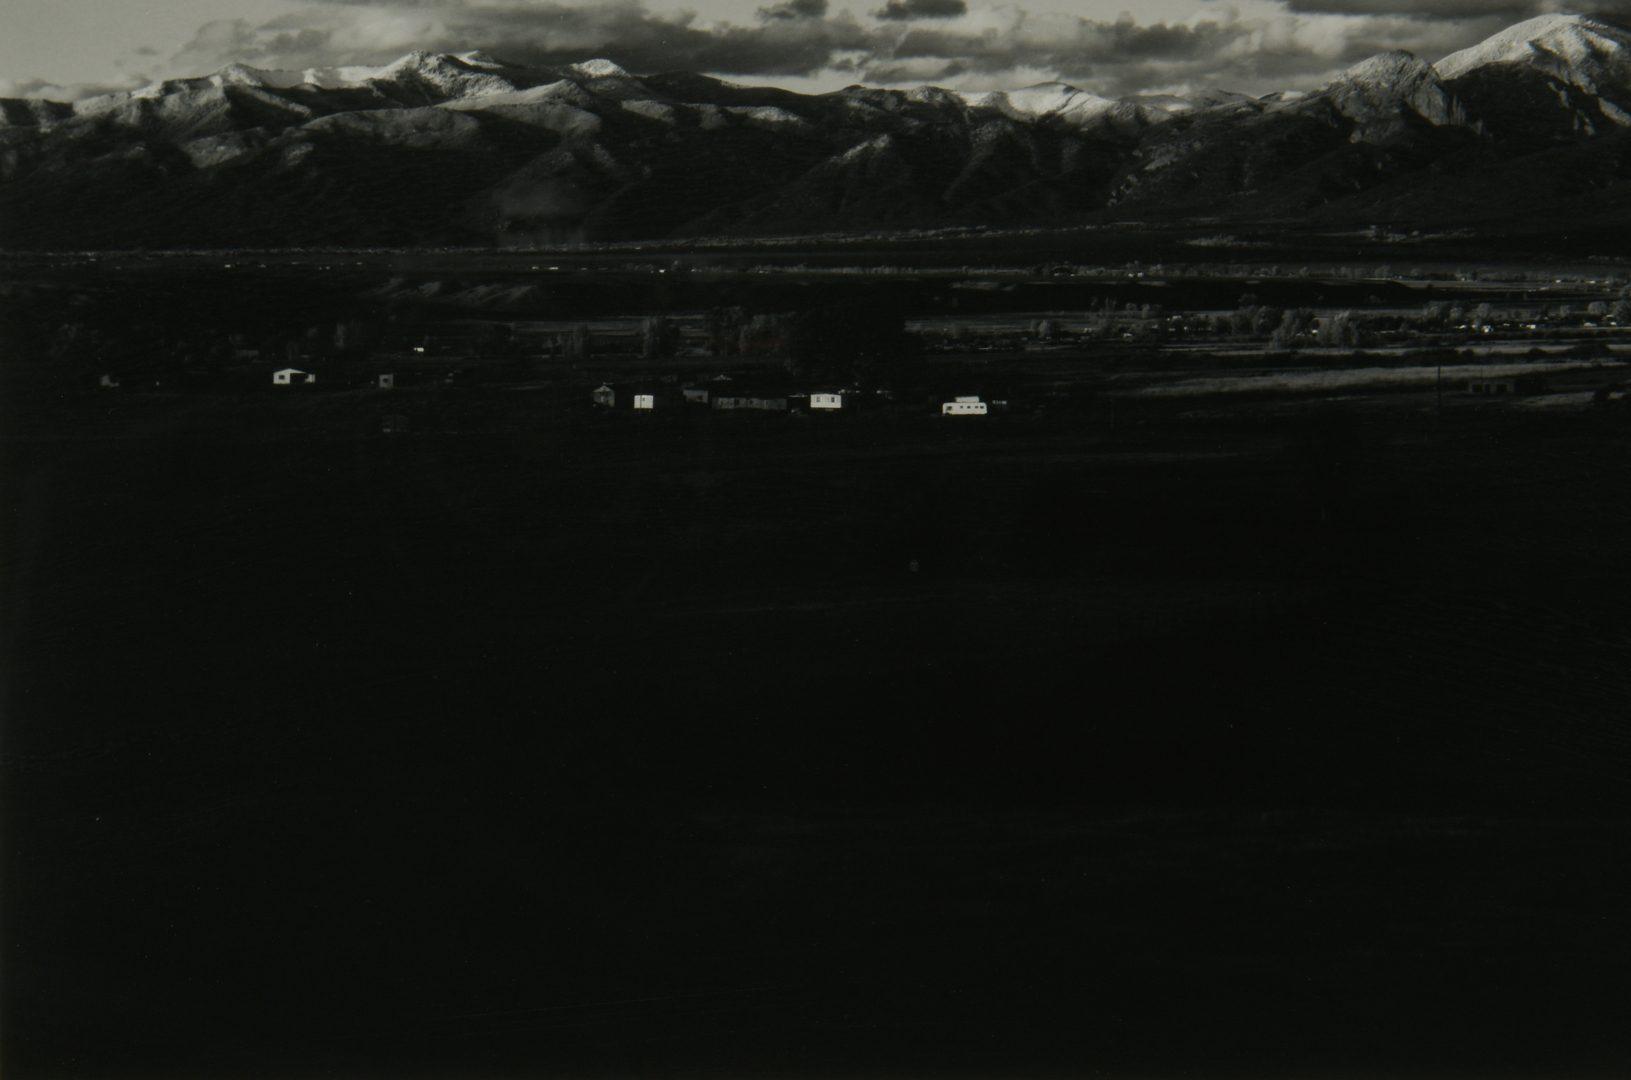 Lot 464: Jack Spencer Southwestern Photograph